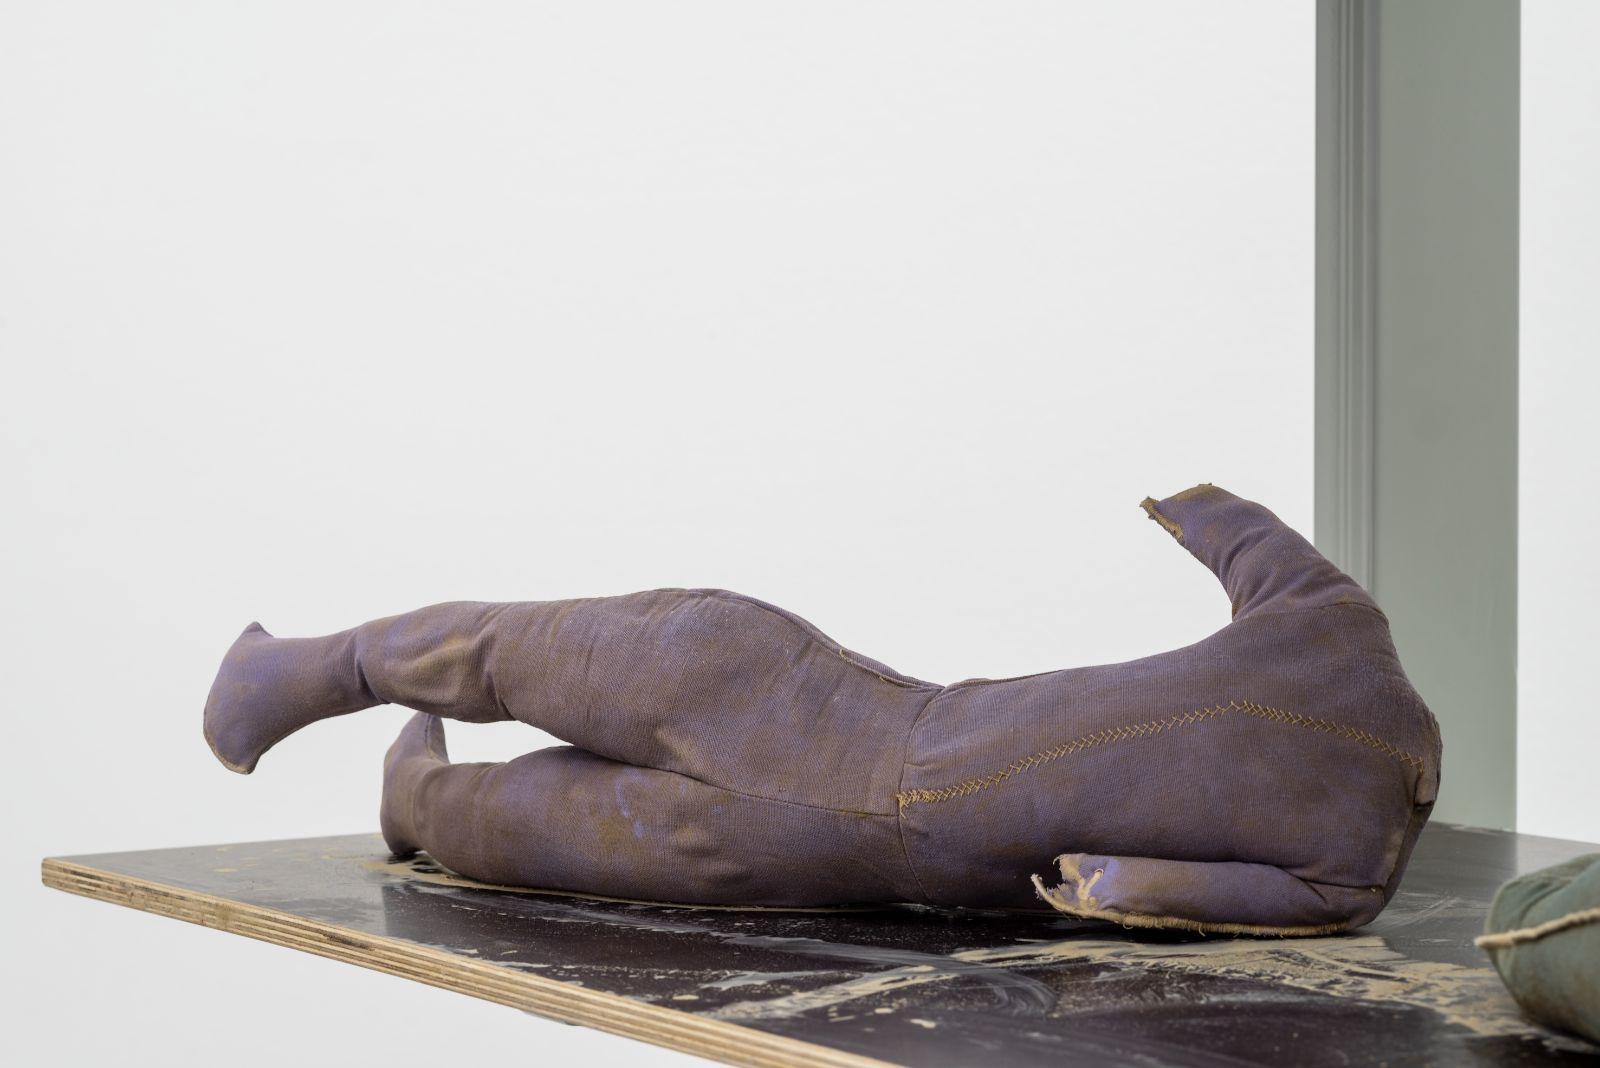 Detail from Large E-shelf, 2015, steel, shelf, clay, glass tube, fabric, 230 x 85 x 60 cm